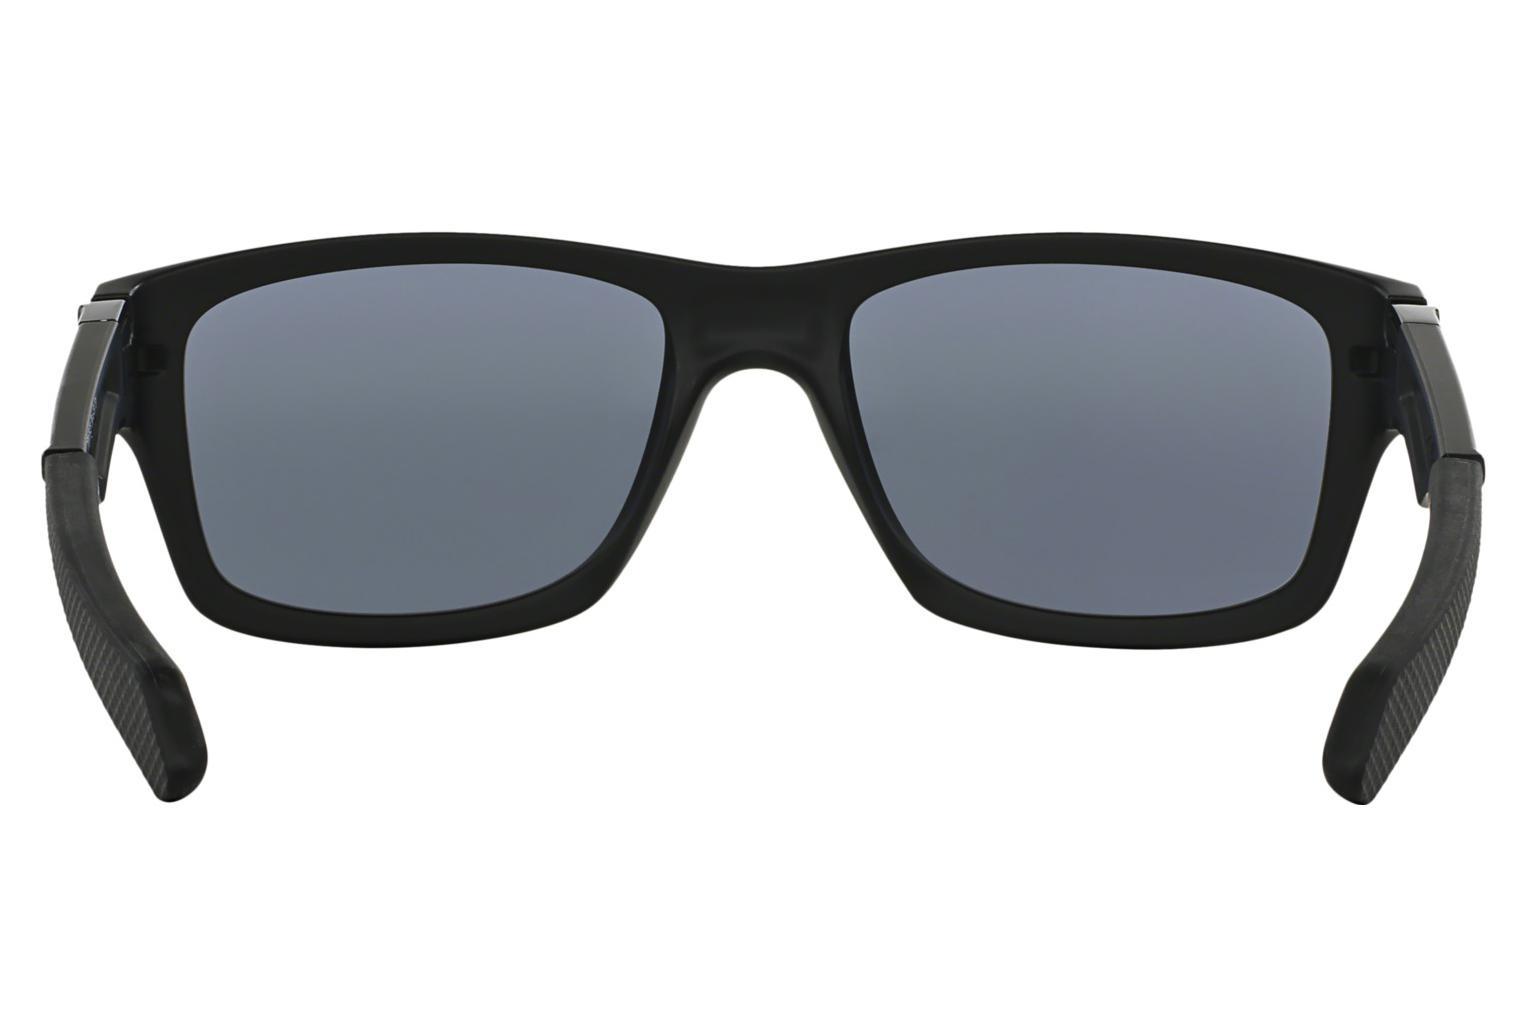 d3582b22ce0 Oakley Sunglasses Jupiter Squared Matte Black   Grey   Ref. OO9135 ...